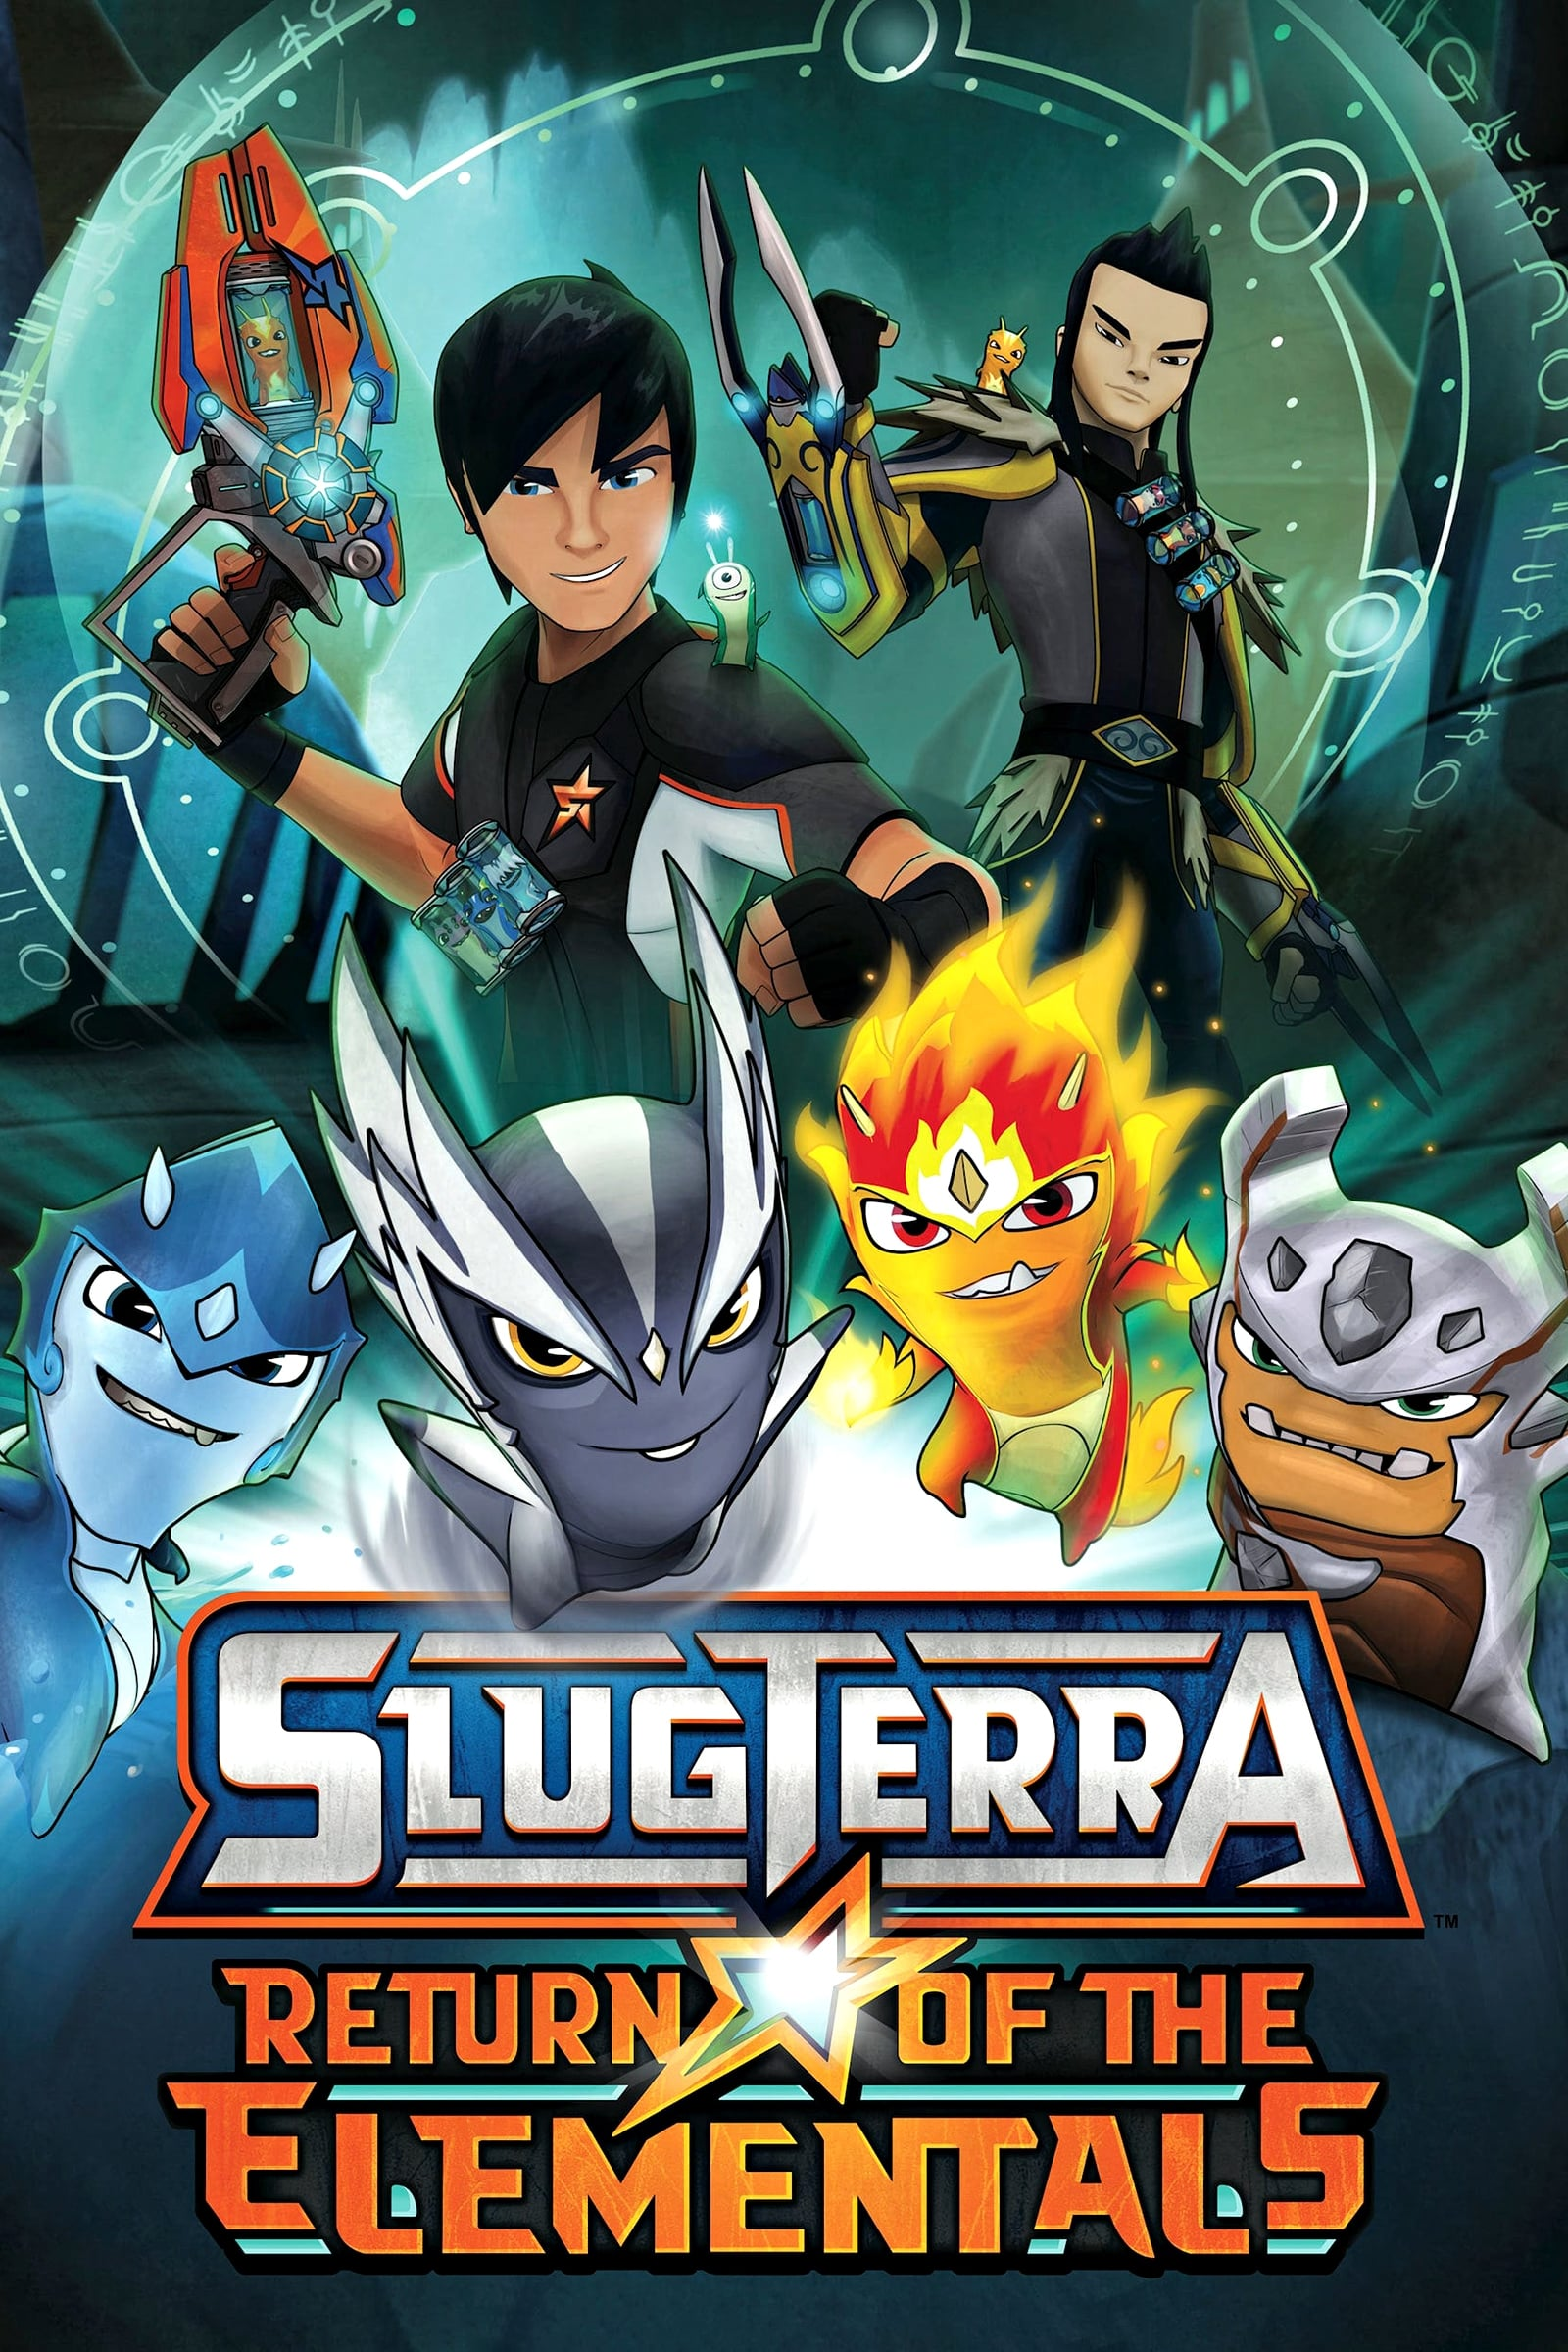 SlugTerra: Return of the Elementals (2014)